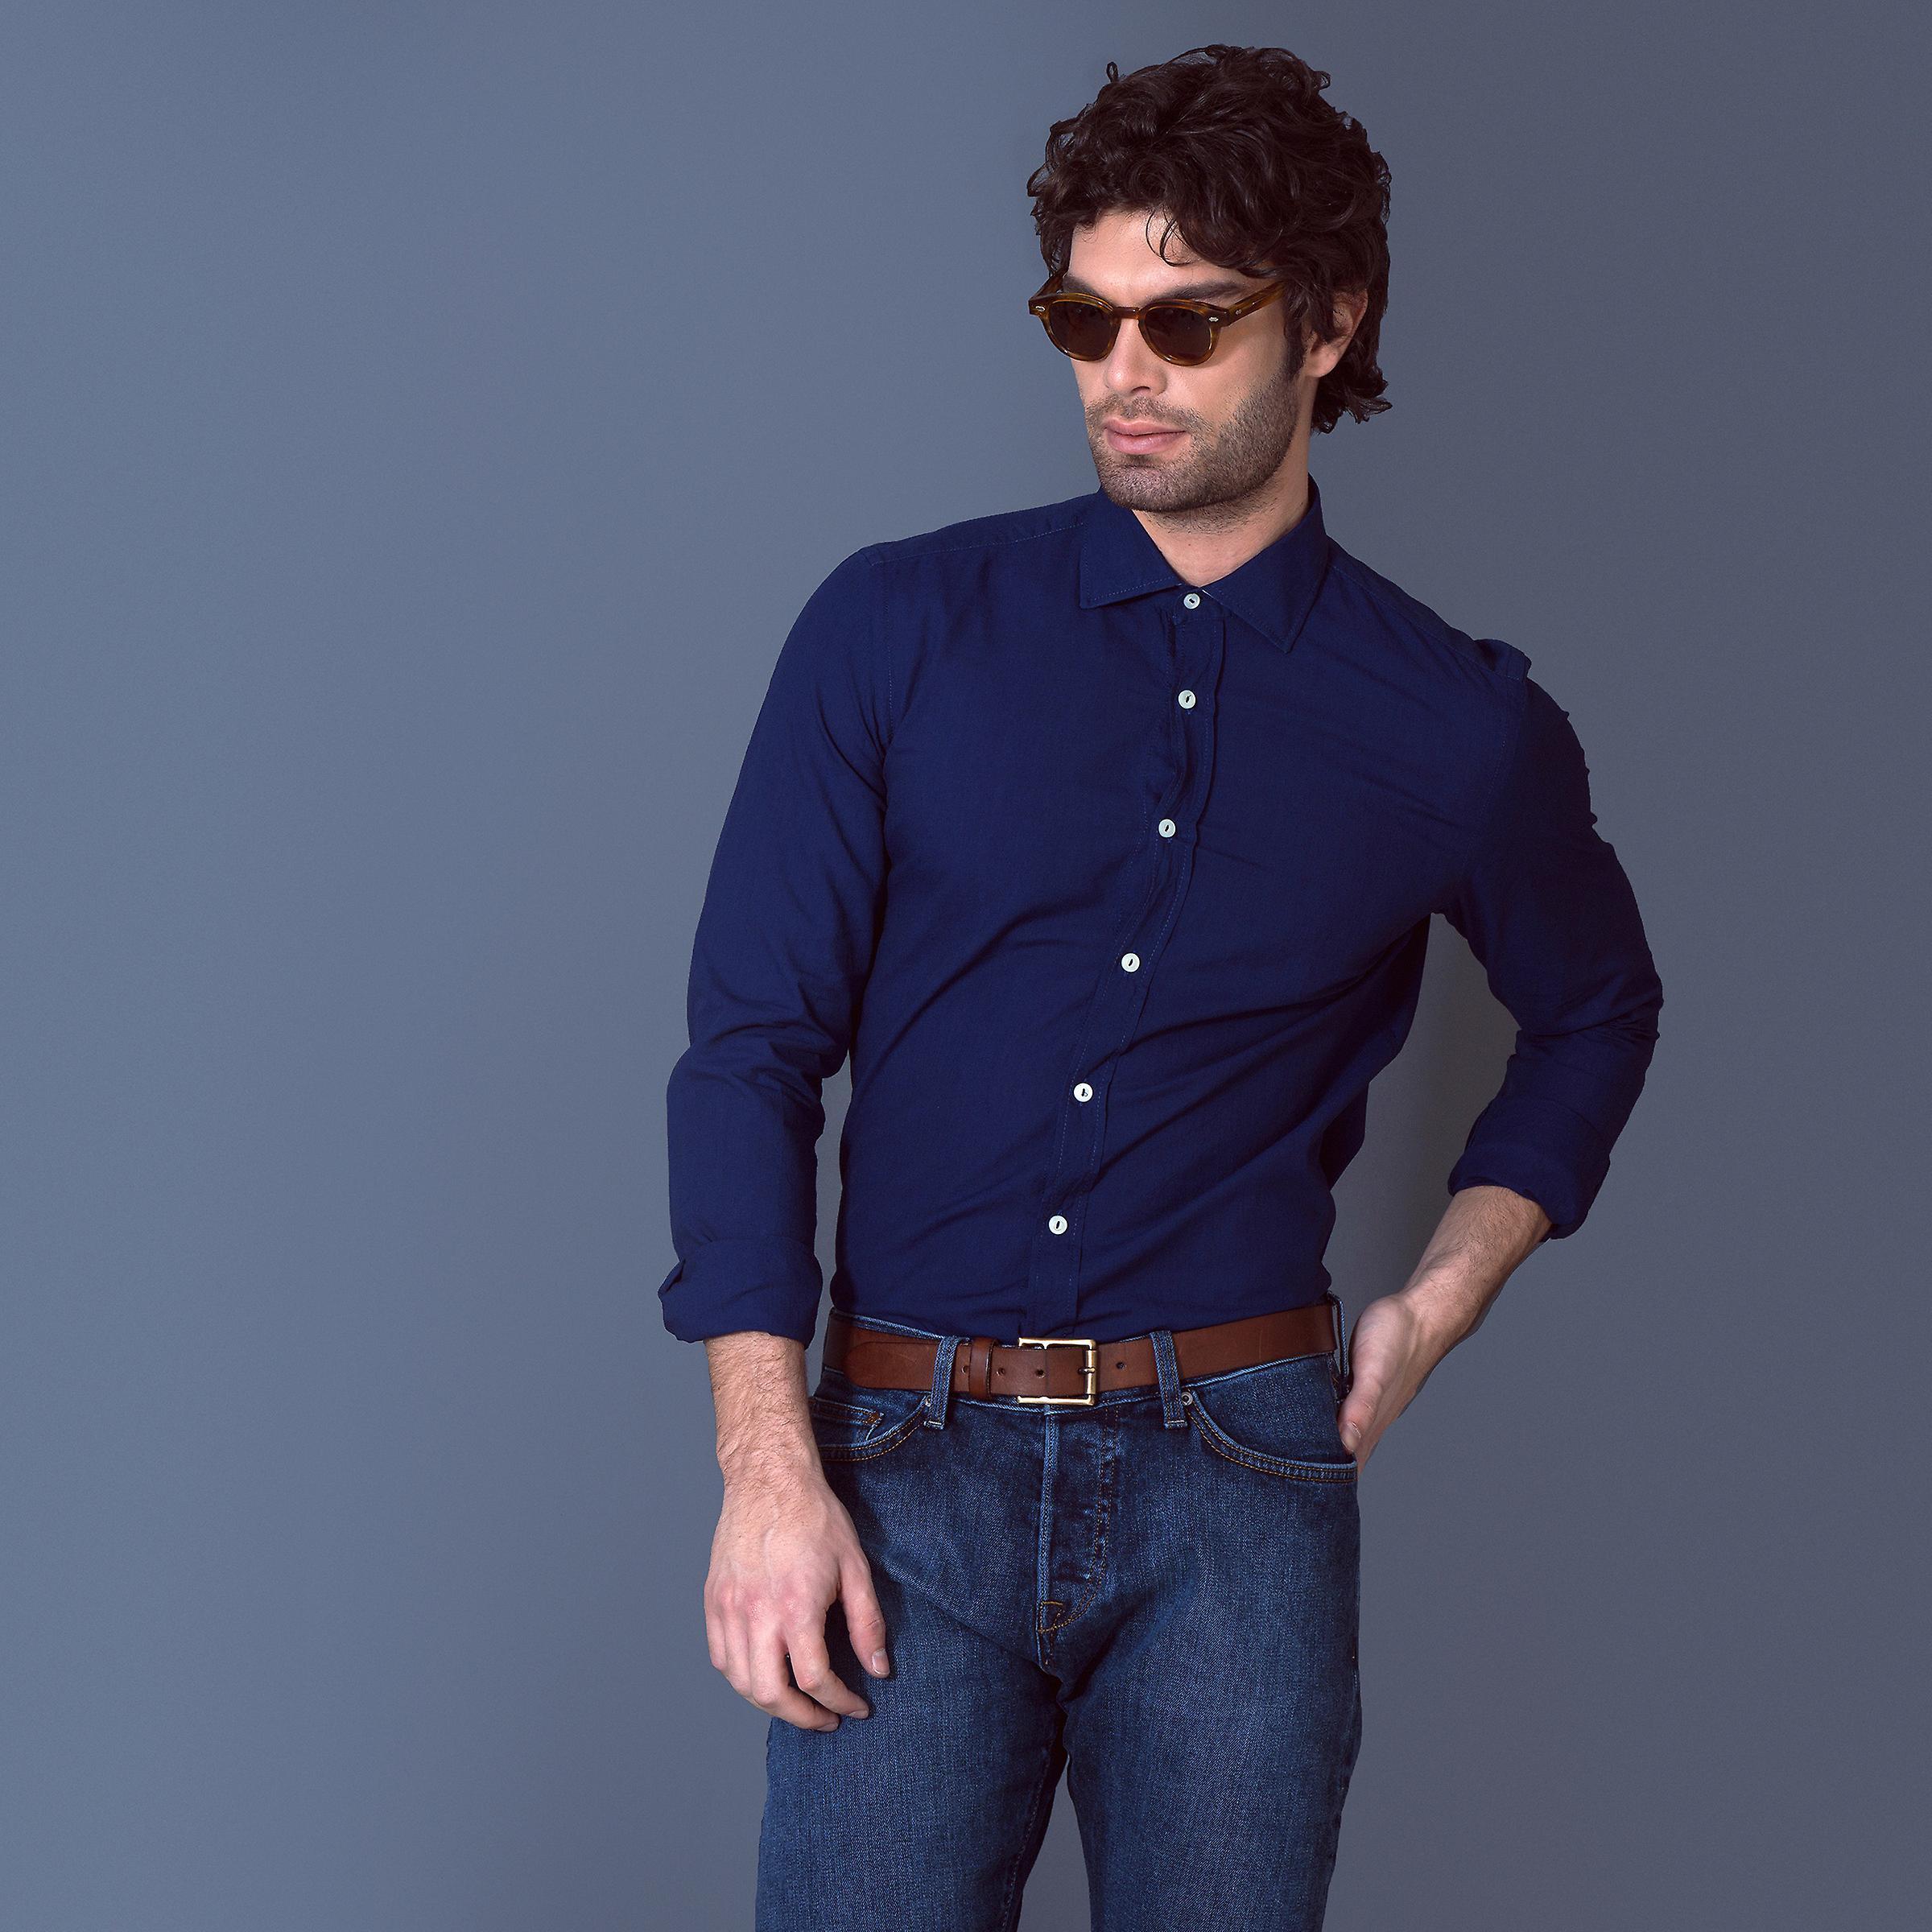 Fabio Giovanni Albergo Shirt - Finest Italian Navy Cotton Mens Casual Shirt